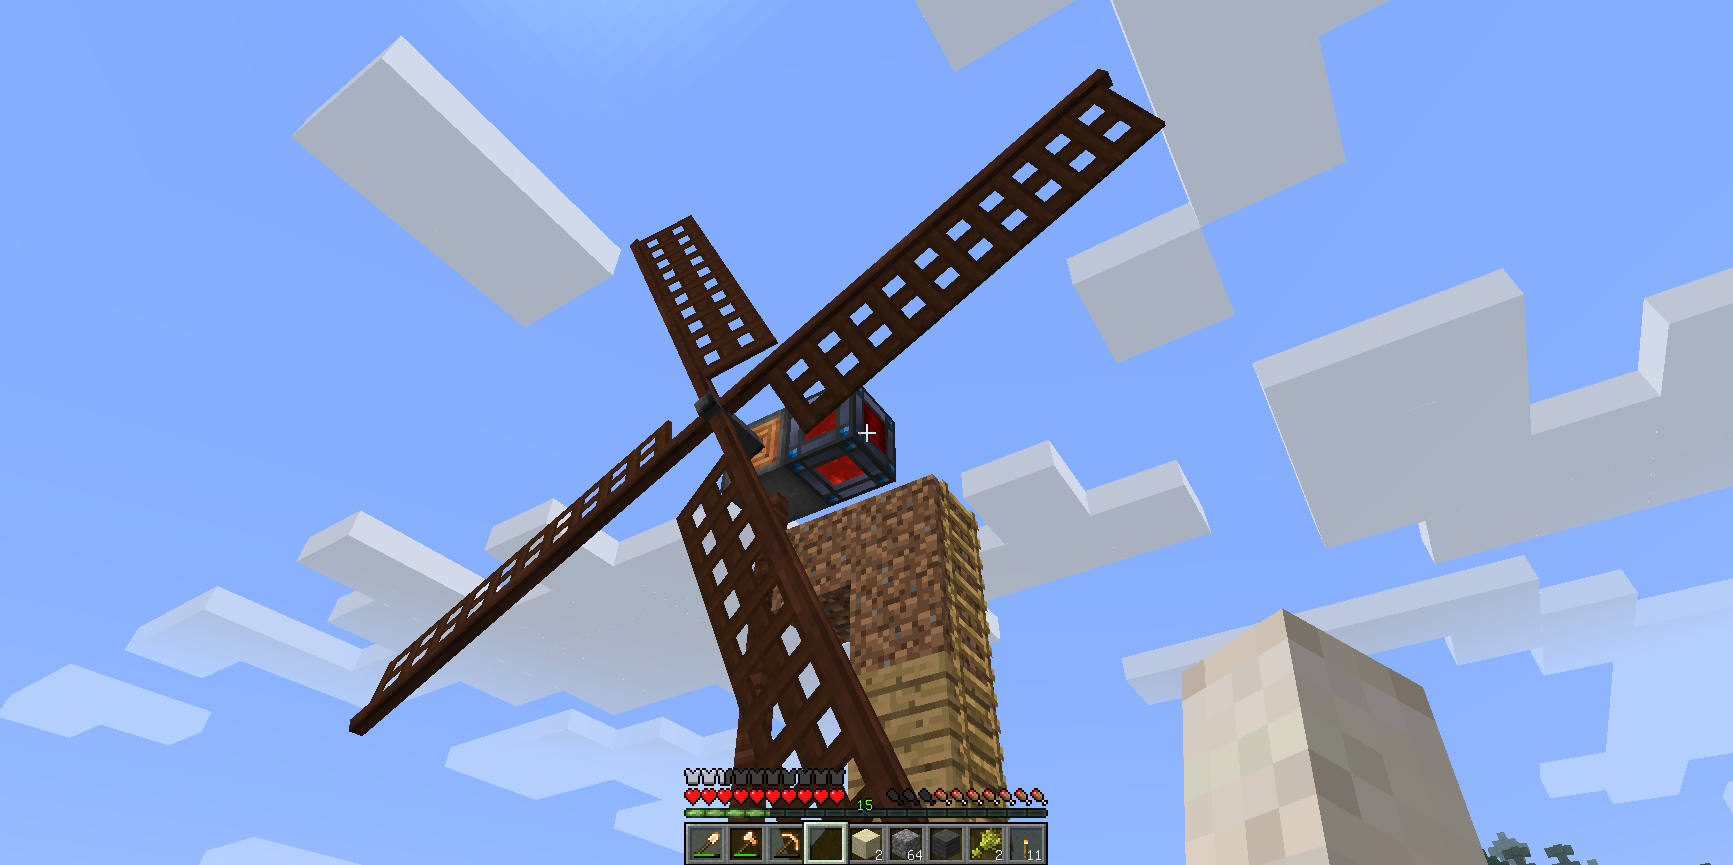 Immersive EngineeringのRF発電機である風車。設置した高度に応じて発電量が変わる。